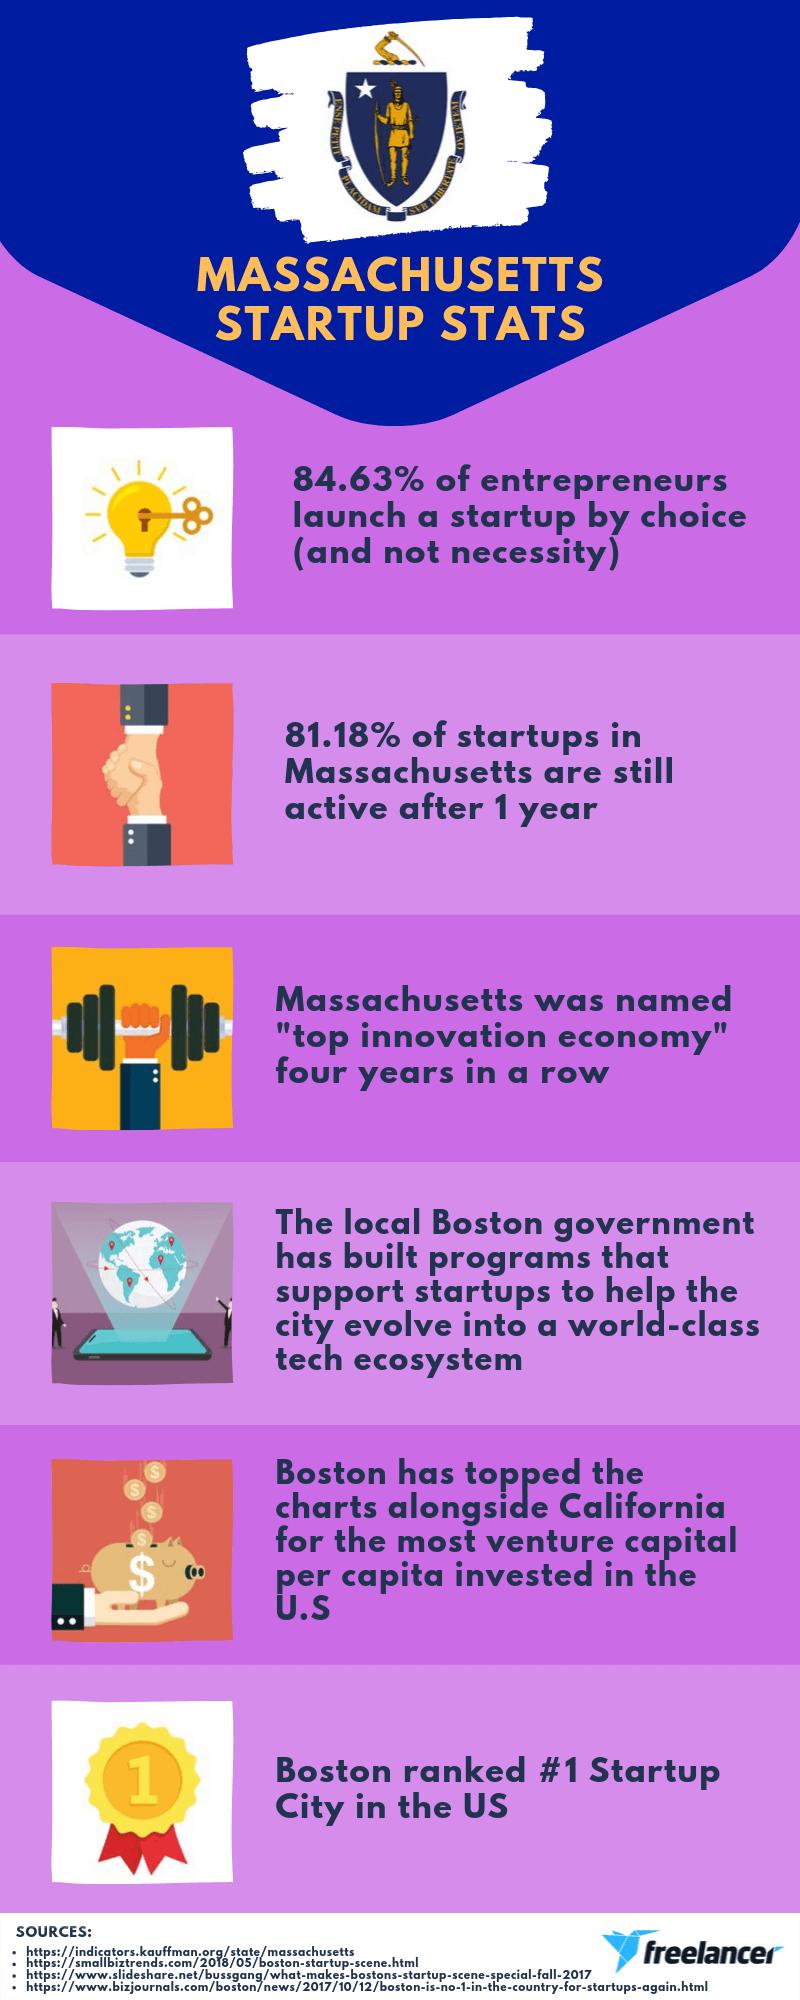 Massachusetts startup stats infographic